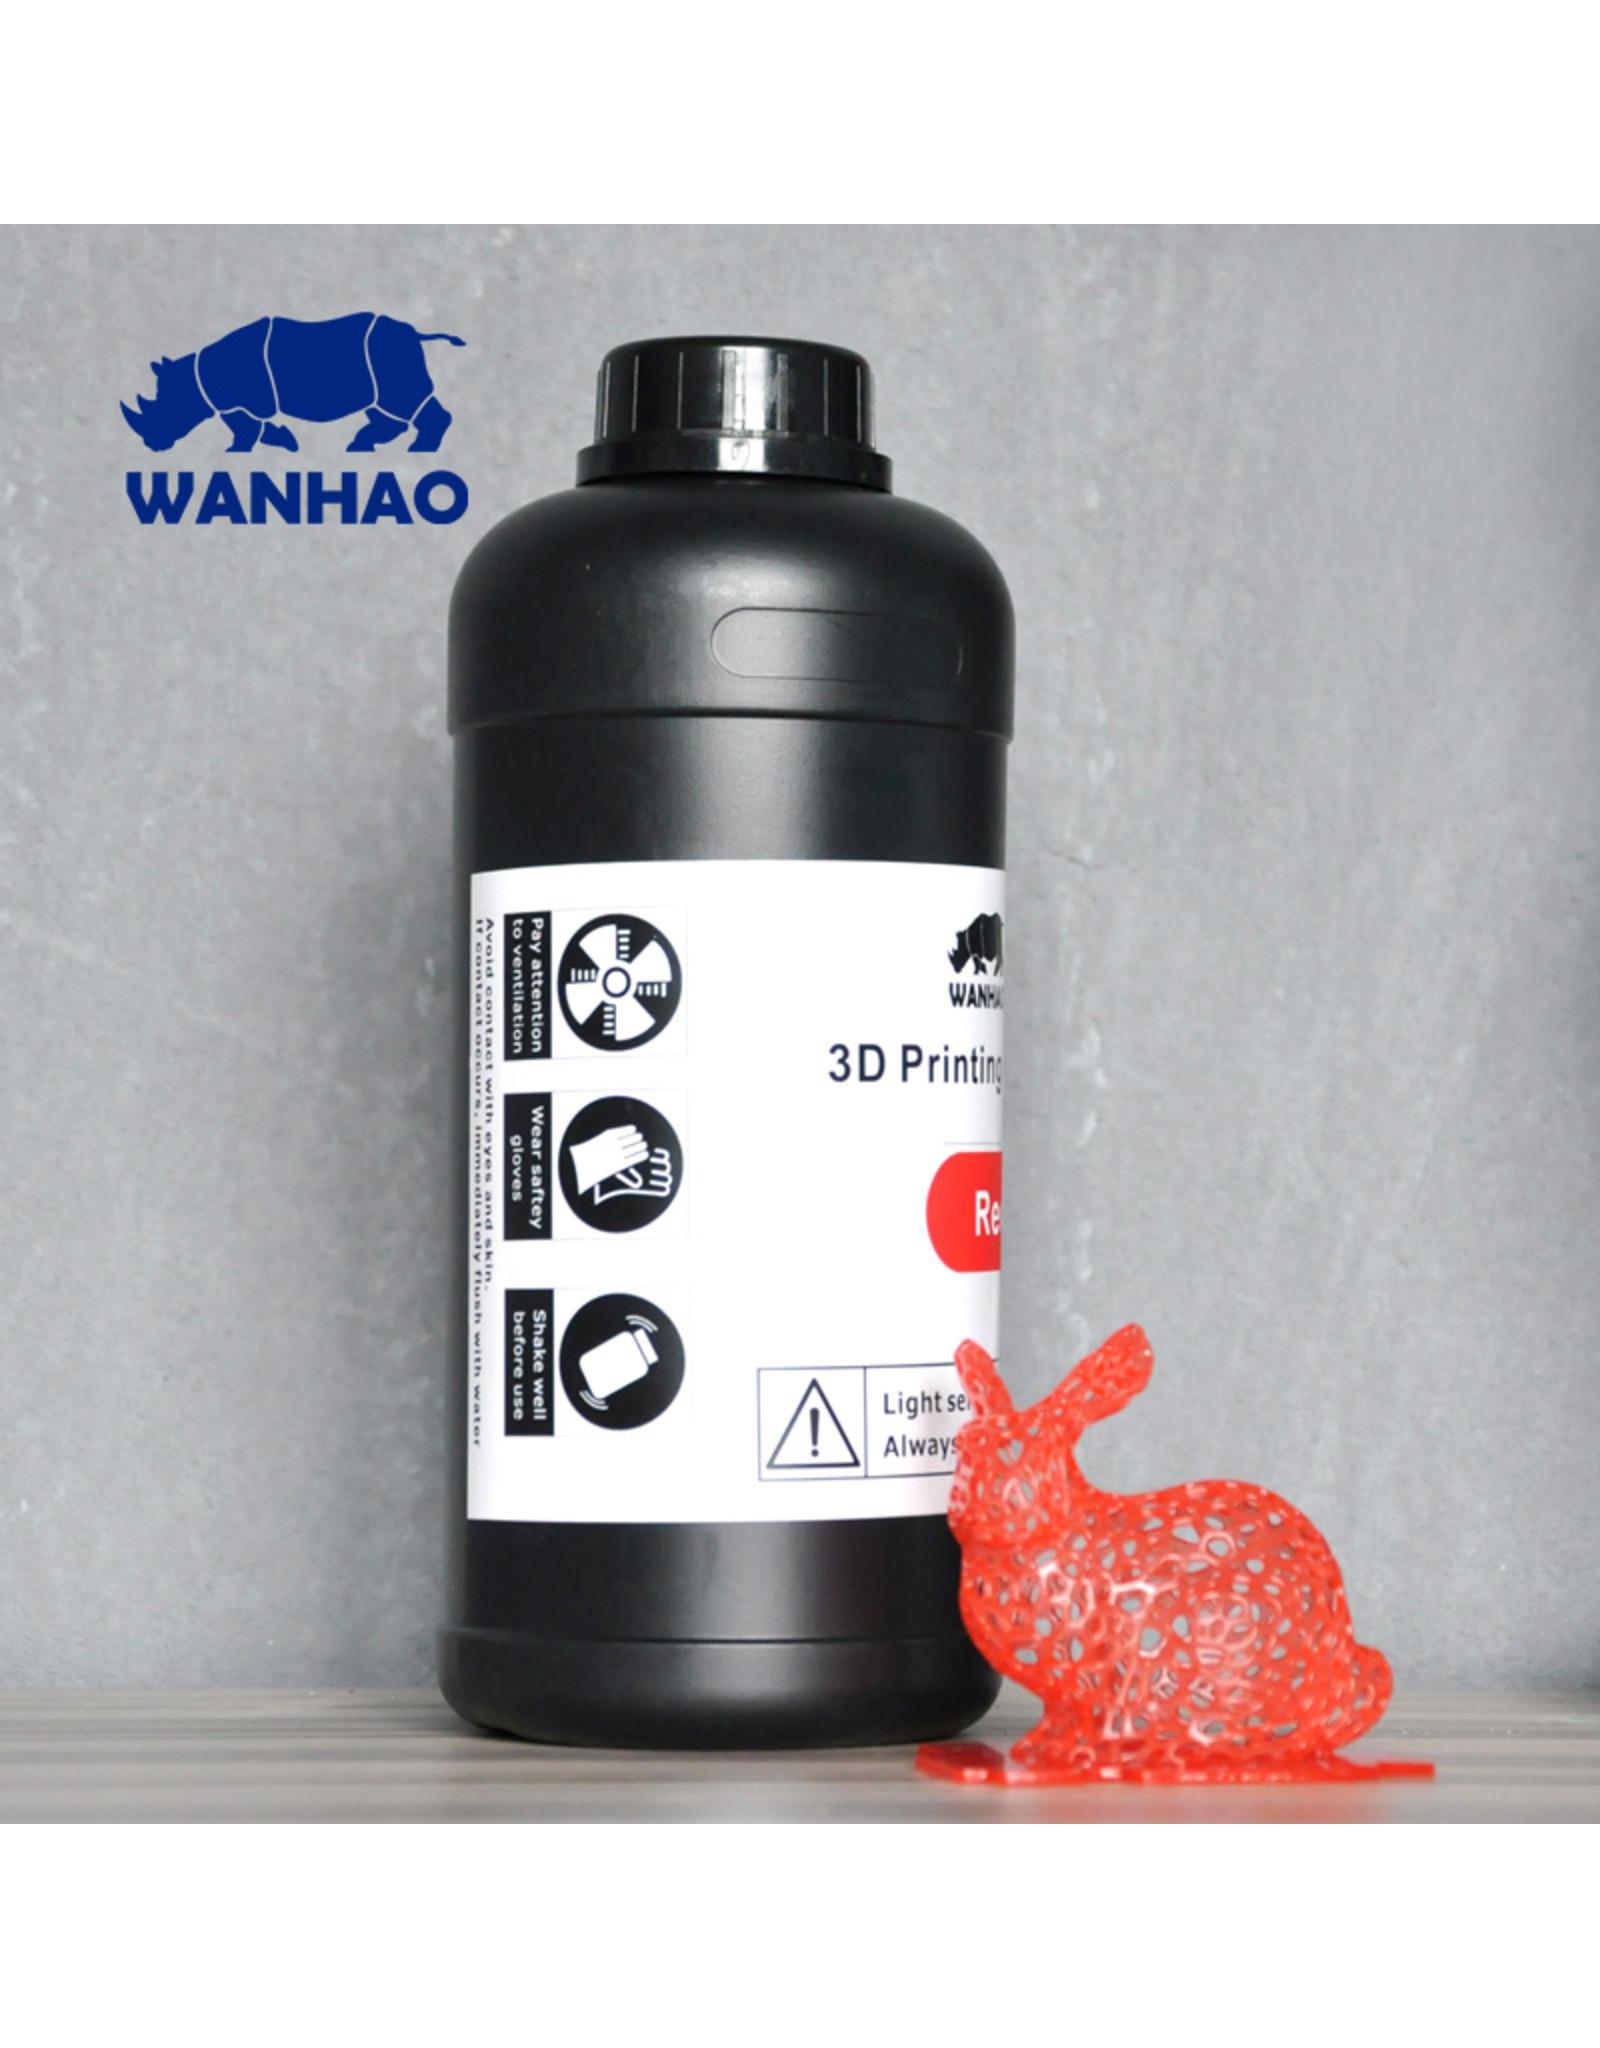 Wanhao Wanhao 3D-Printer UV Resin - 1000 ml -Red